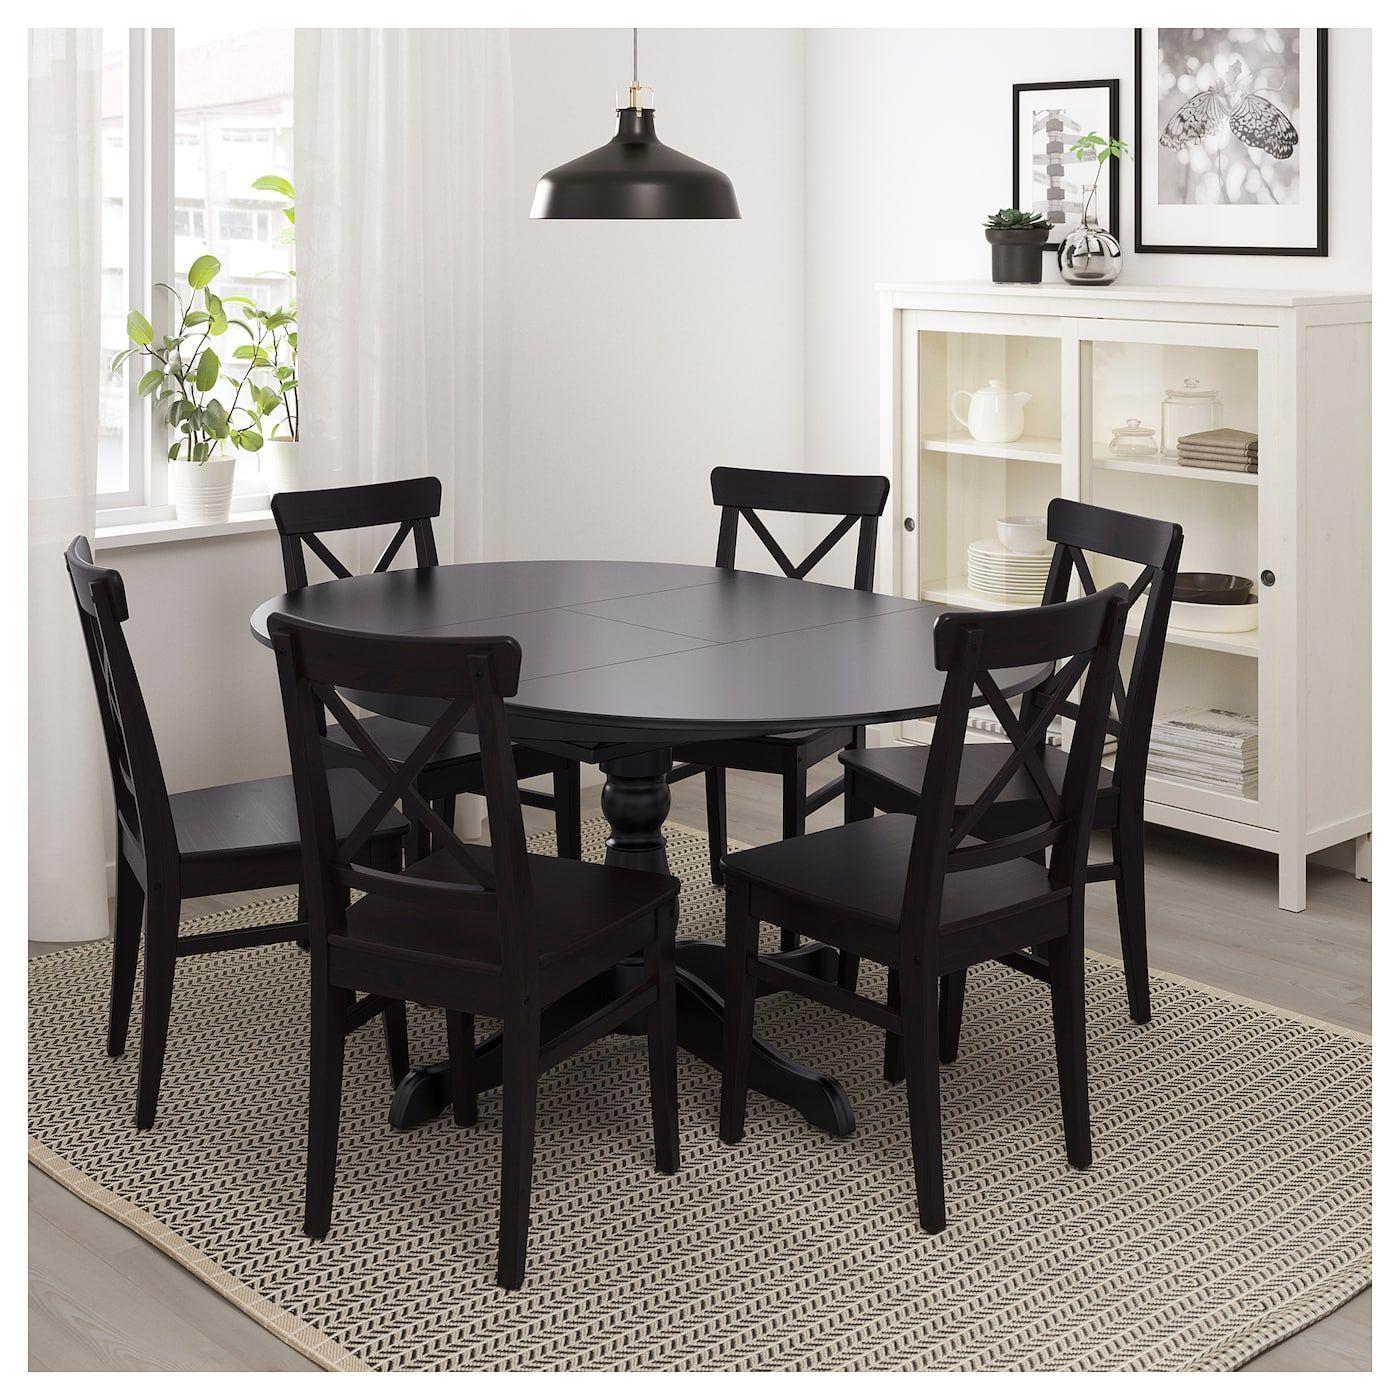 Ingatorp Extendable Table Black Ca Ikea Black Dining Room Table Black Round Dining Table Ikea Dining